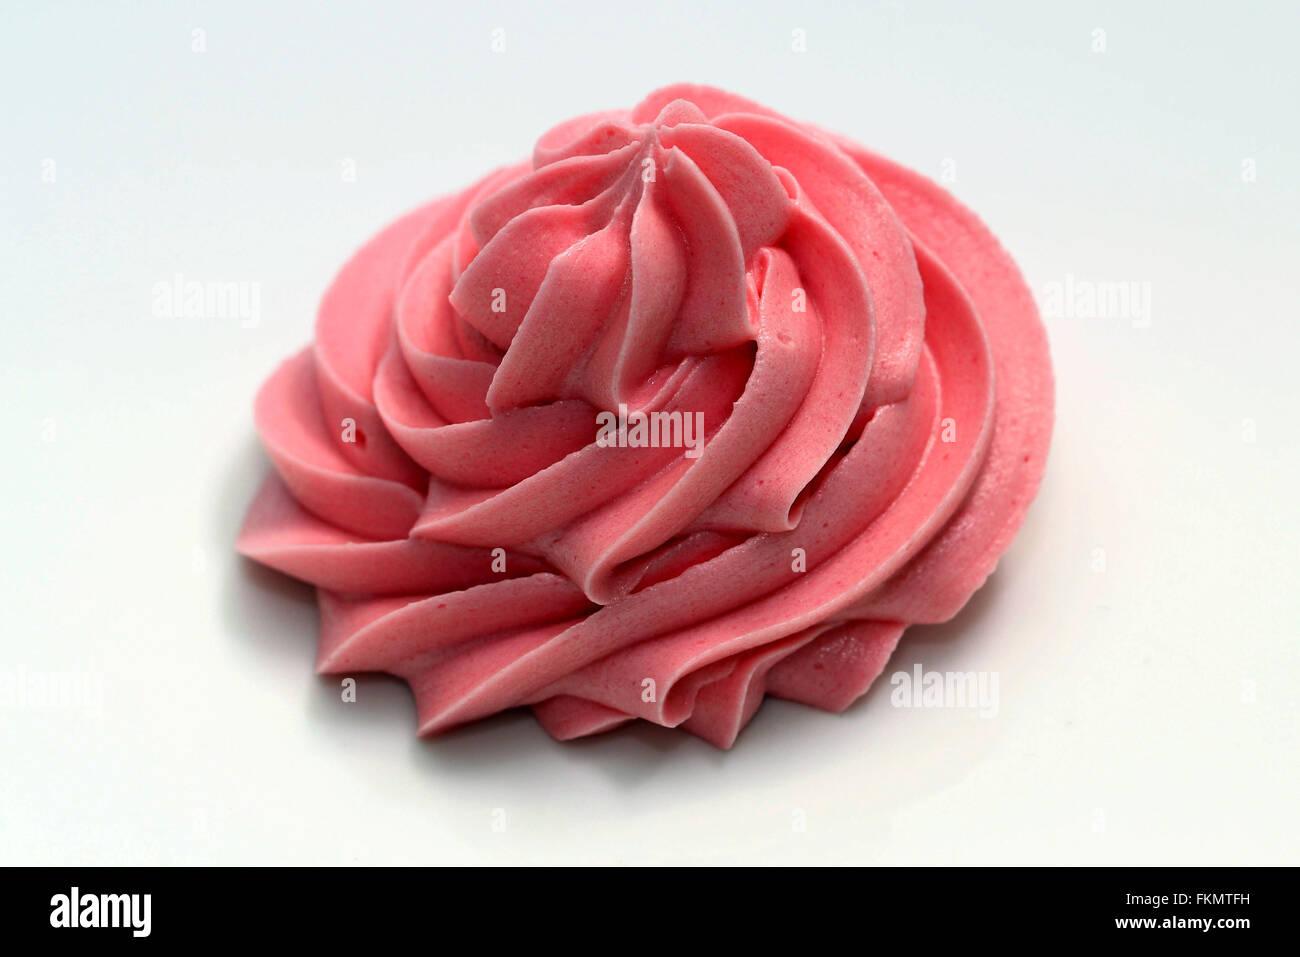 swirl pink icing cream on white background - Stock Image